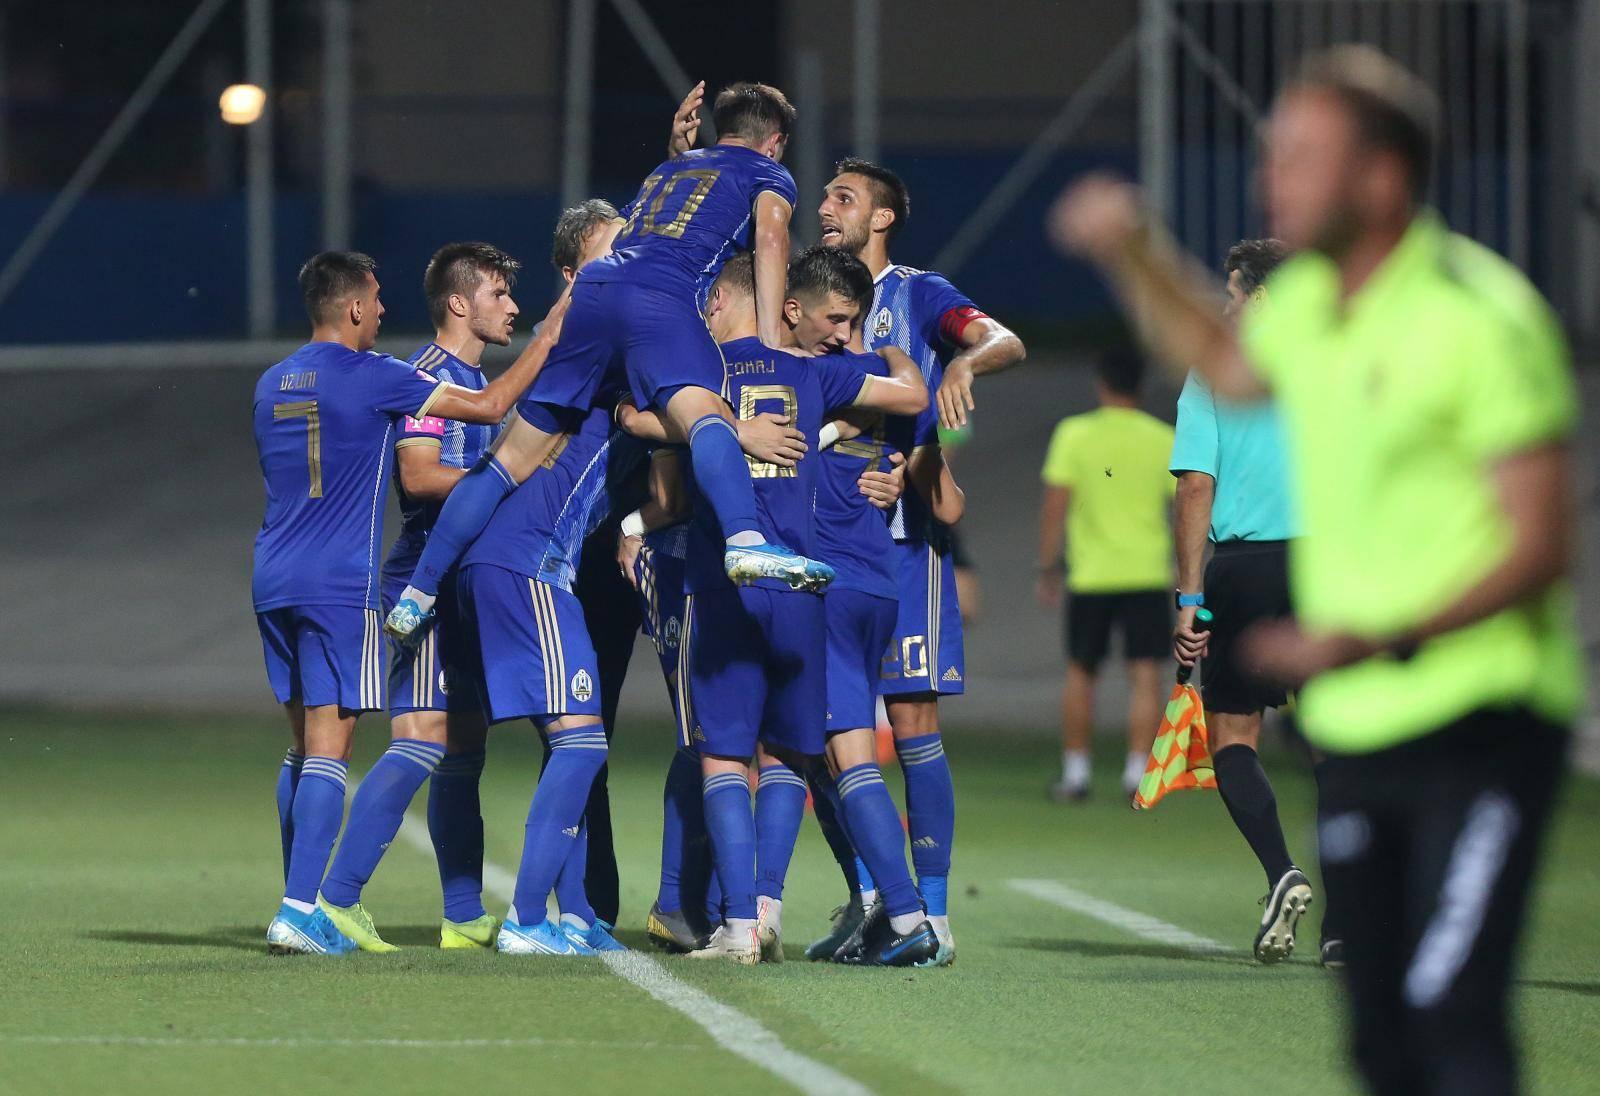 Zagreb: Lokomotiva i Iatra sastali se u 4. kolu HT Prve lige